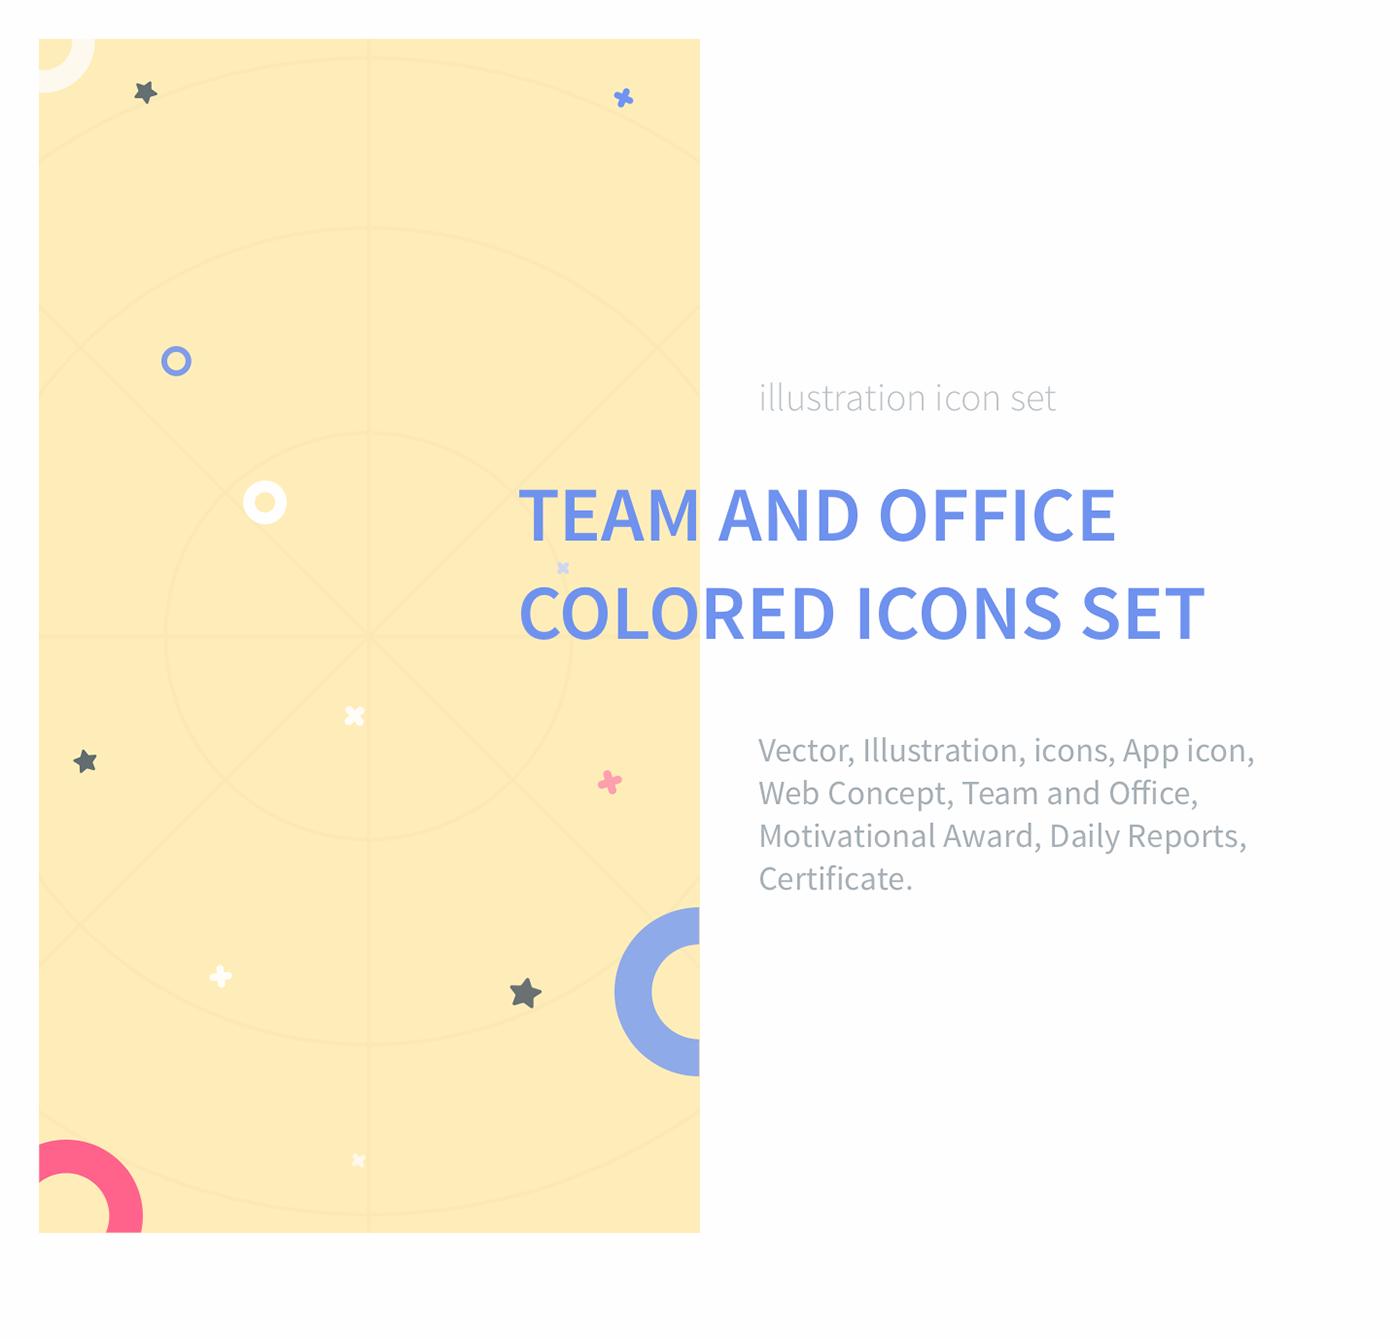 flat Icon icons color set icon set flat icon